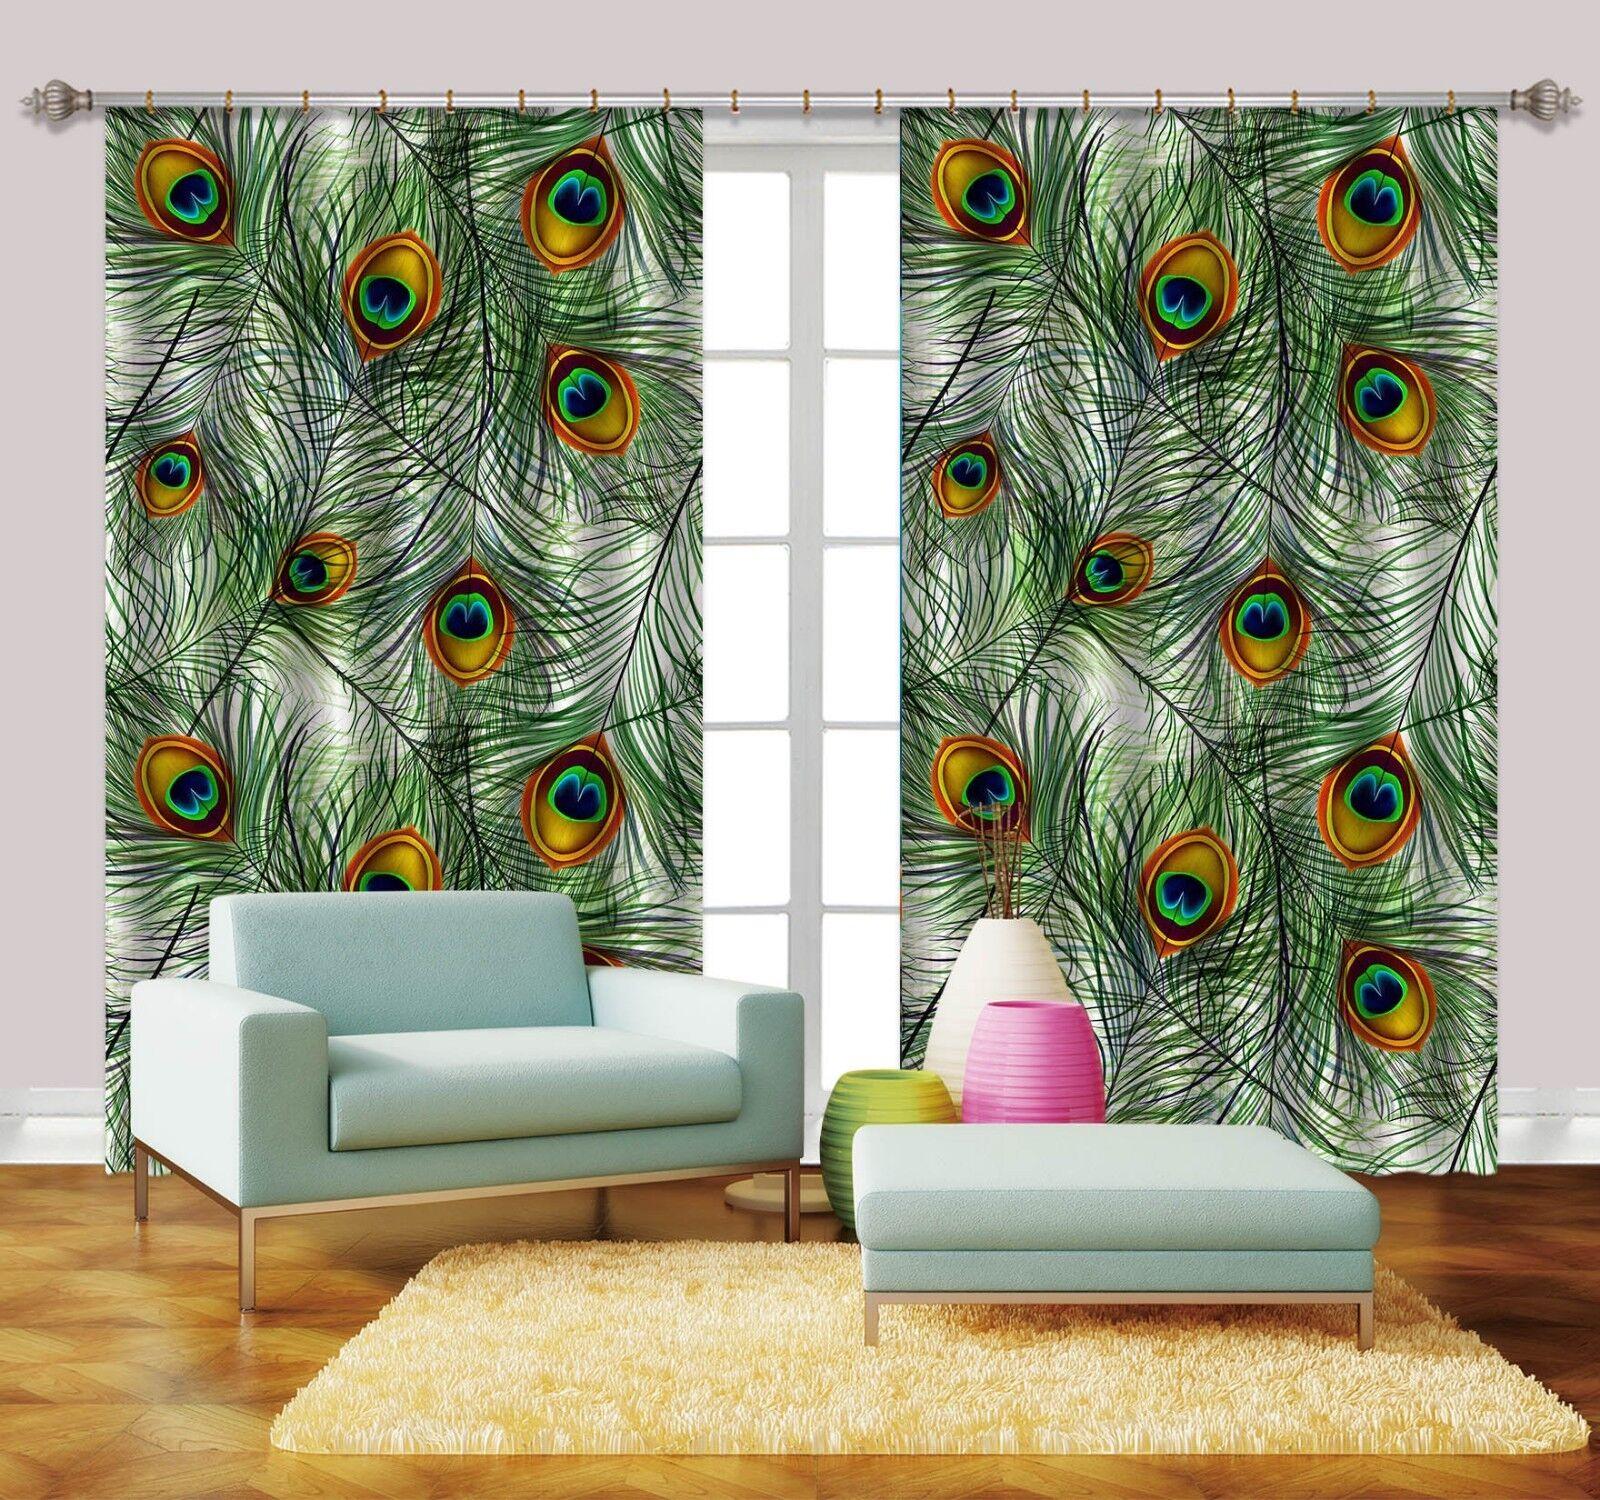 3d verde muelle bloqueo 67 cortina de fotografía presión cortinas cortina de tela de ventana